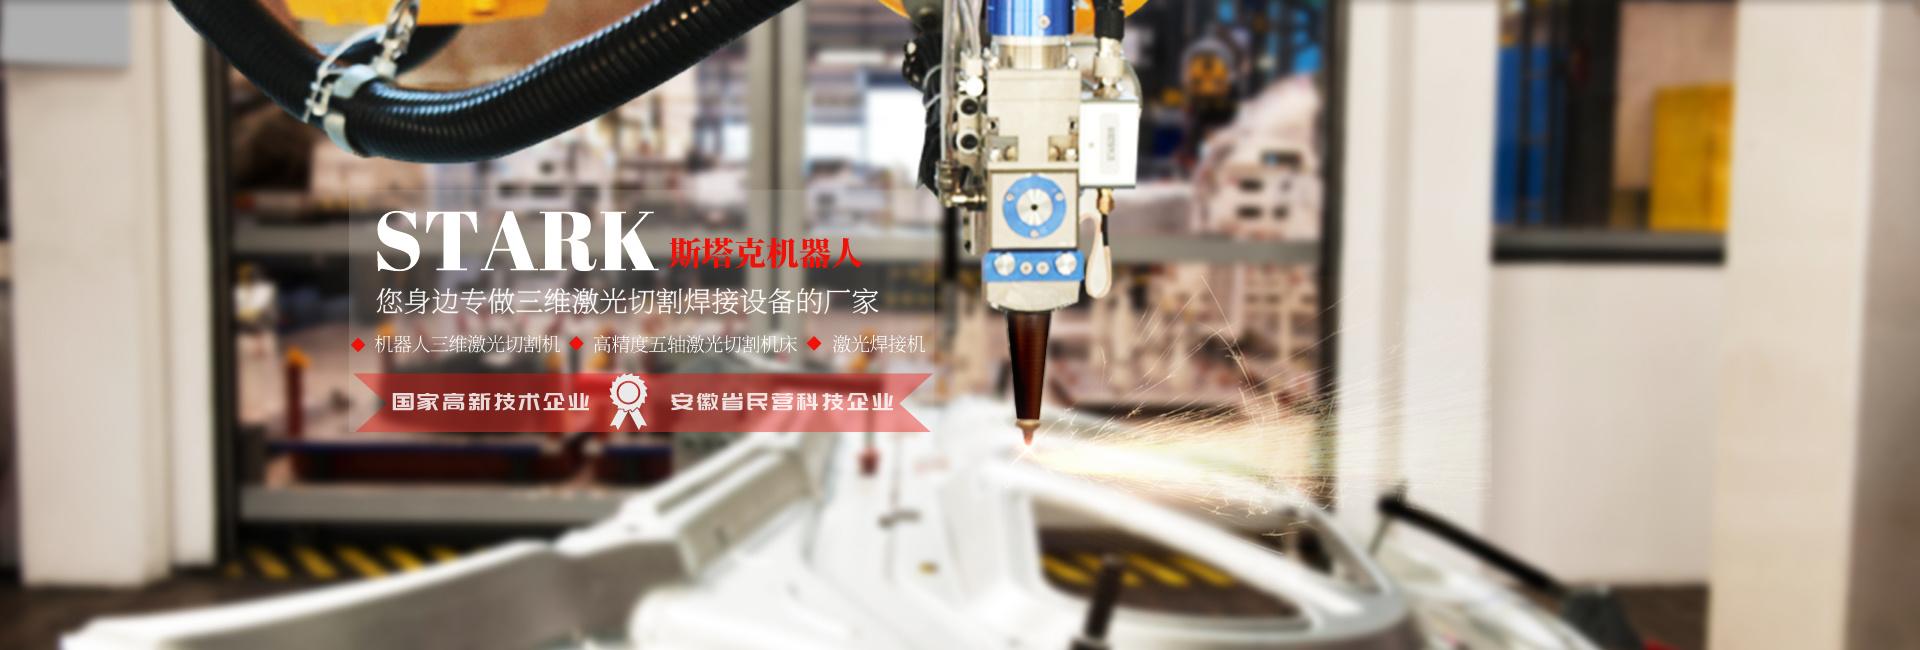 STARK三维激光切割机器人 六轴机械手切割机 金属切割设备 斯塔克激光示例图1